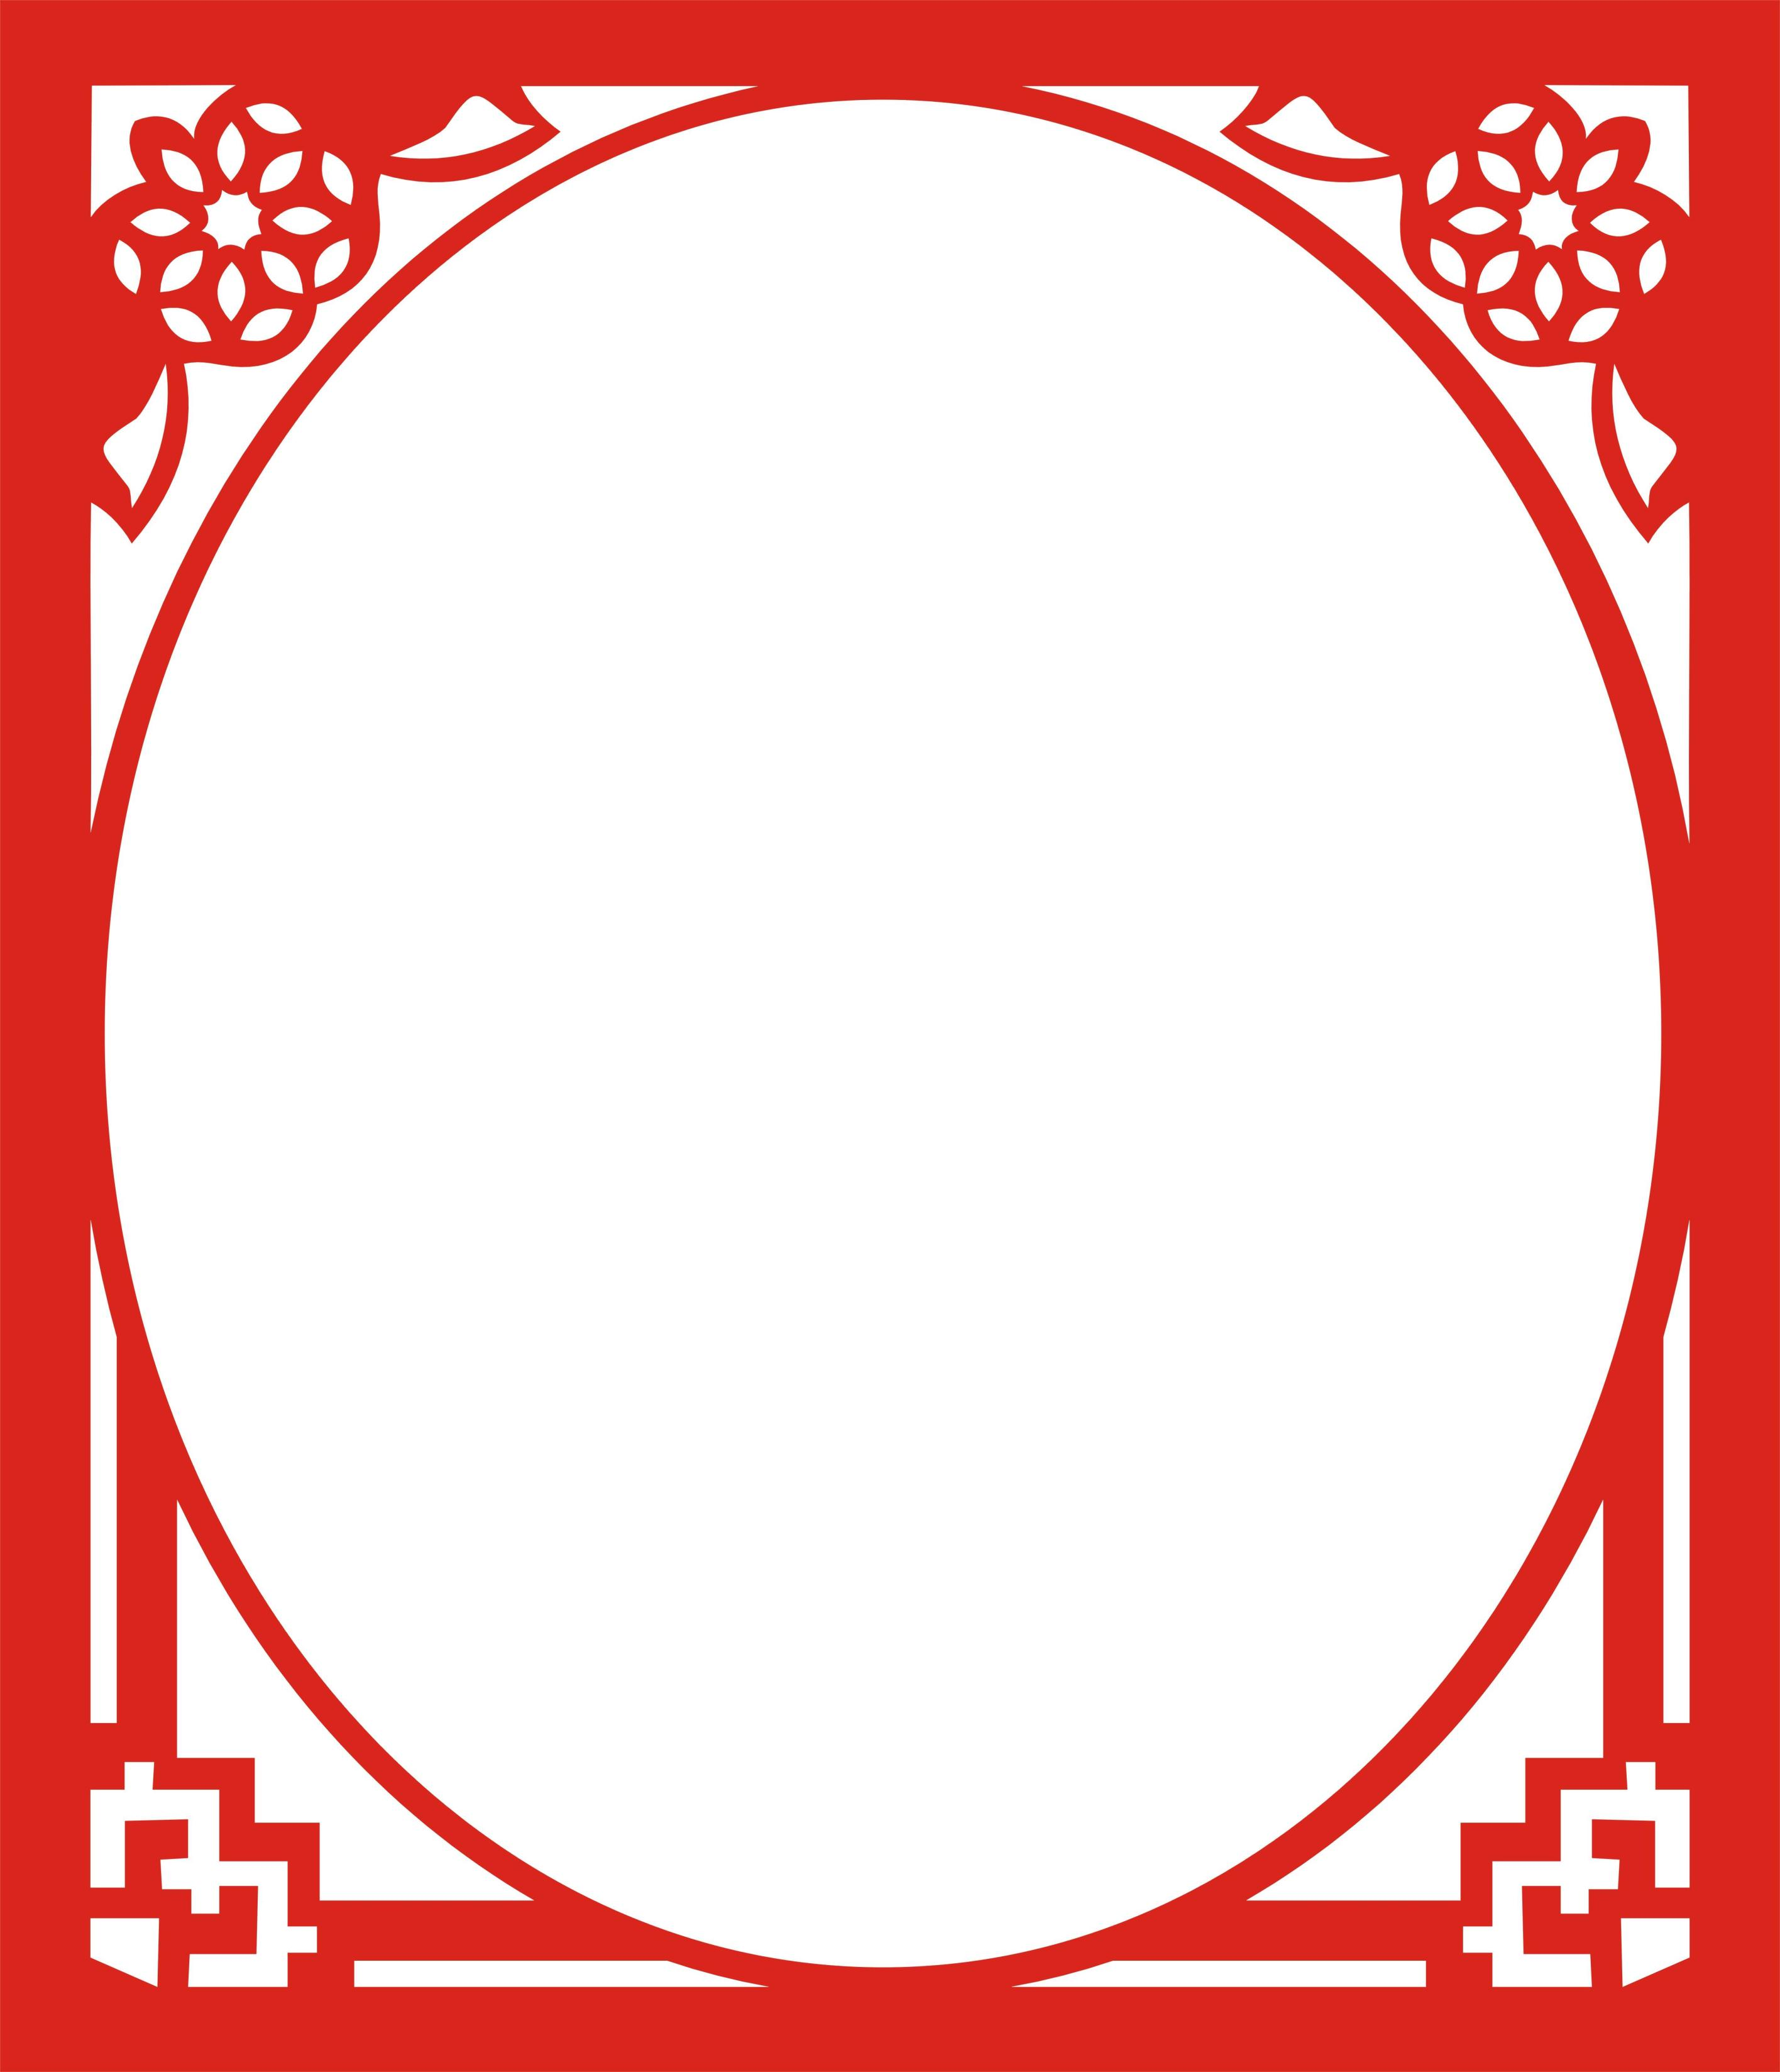 ppt 背景 背景图片 边框 模板 设计 矢量 矢量图 素材 相框 2832_329